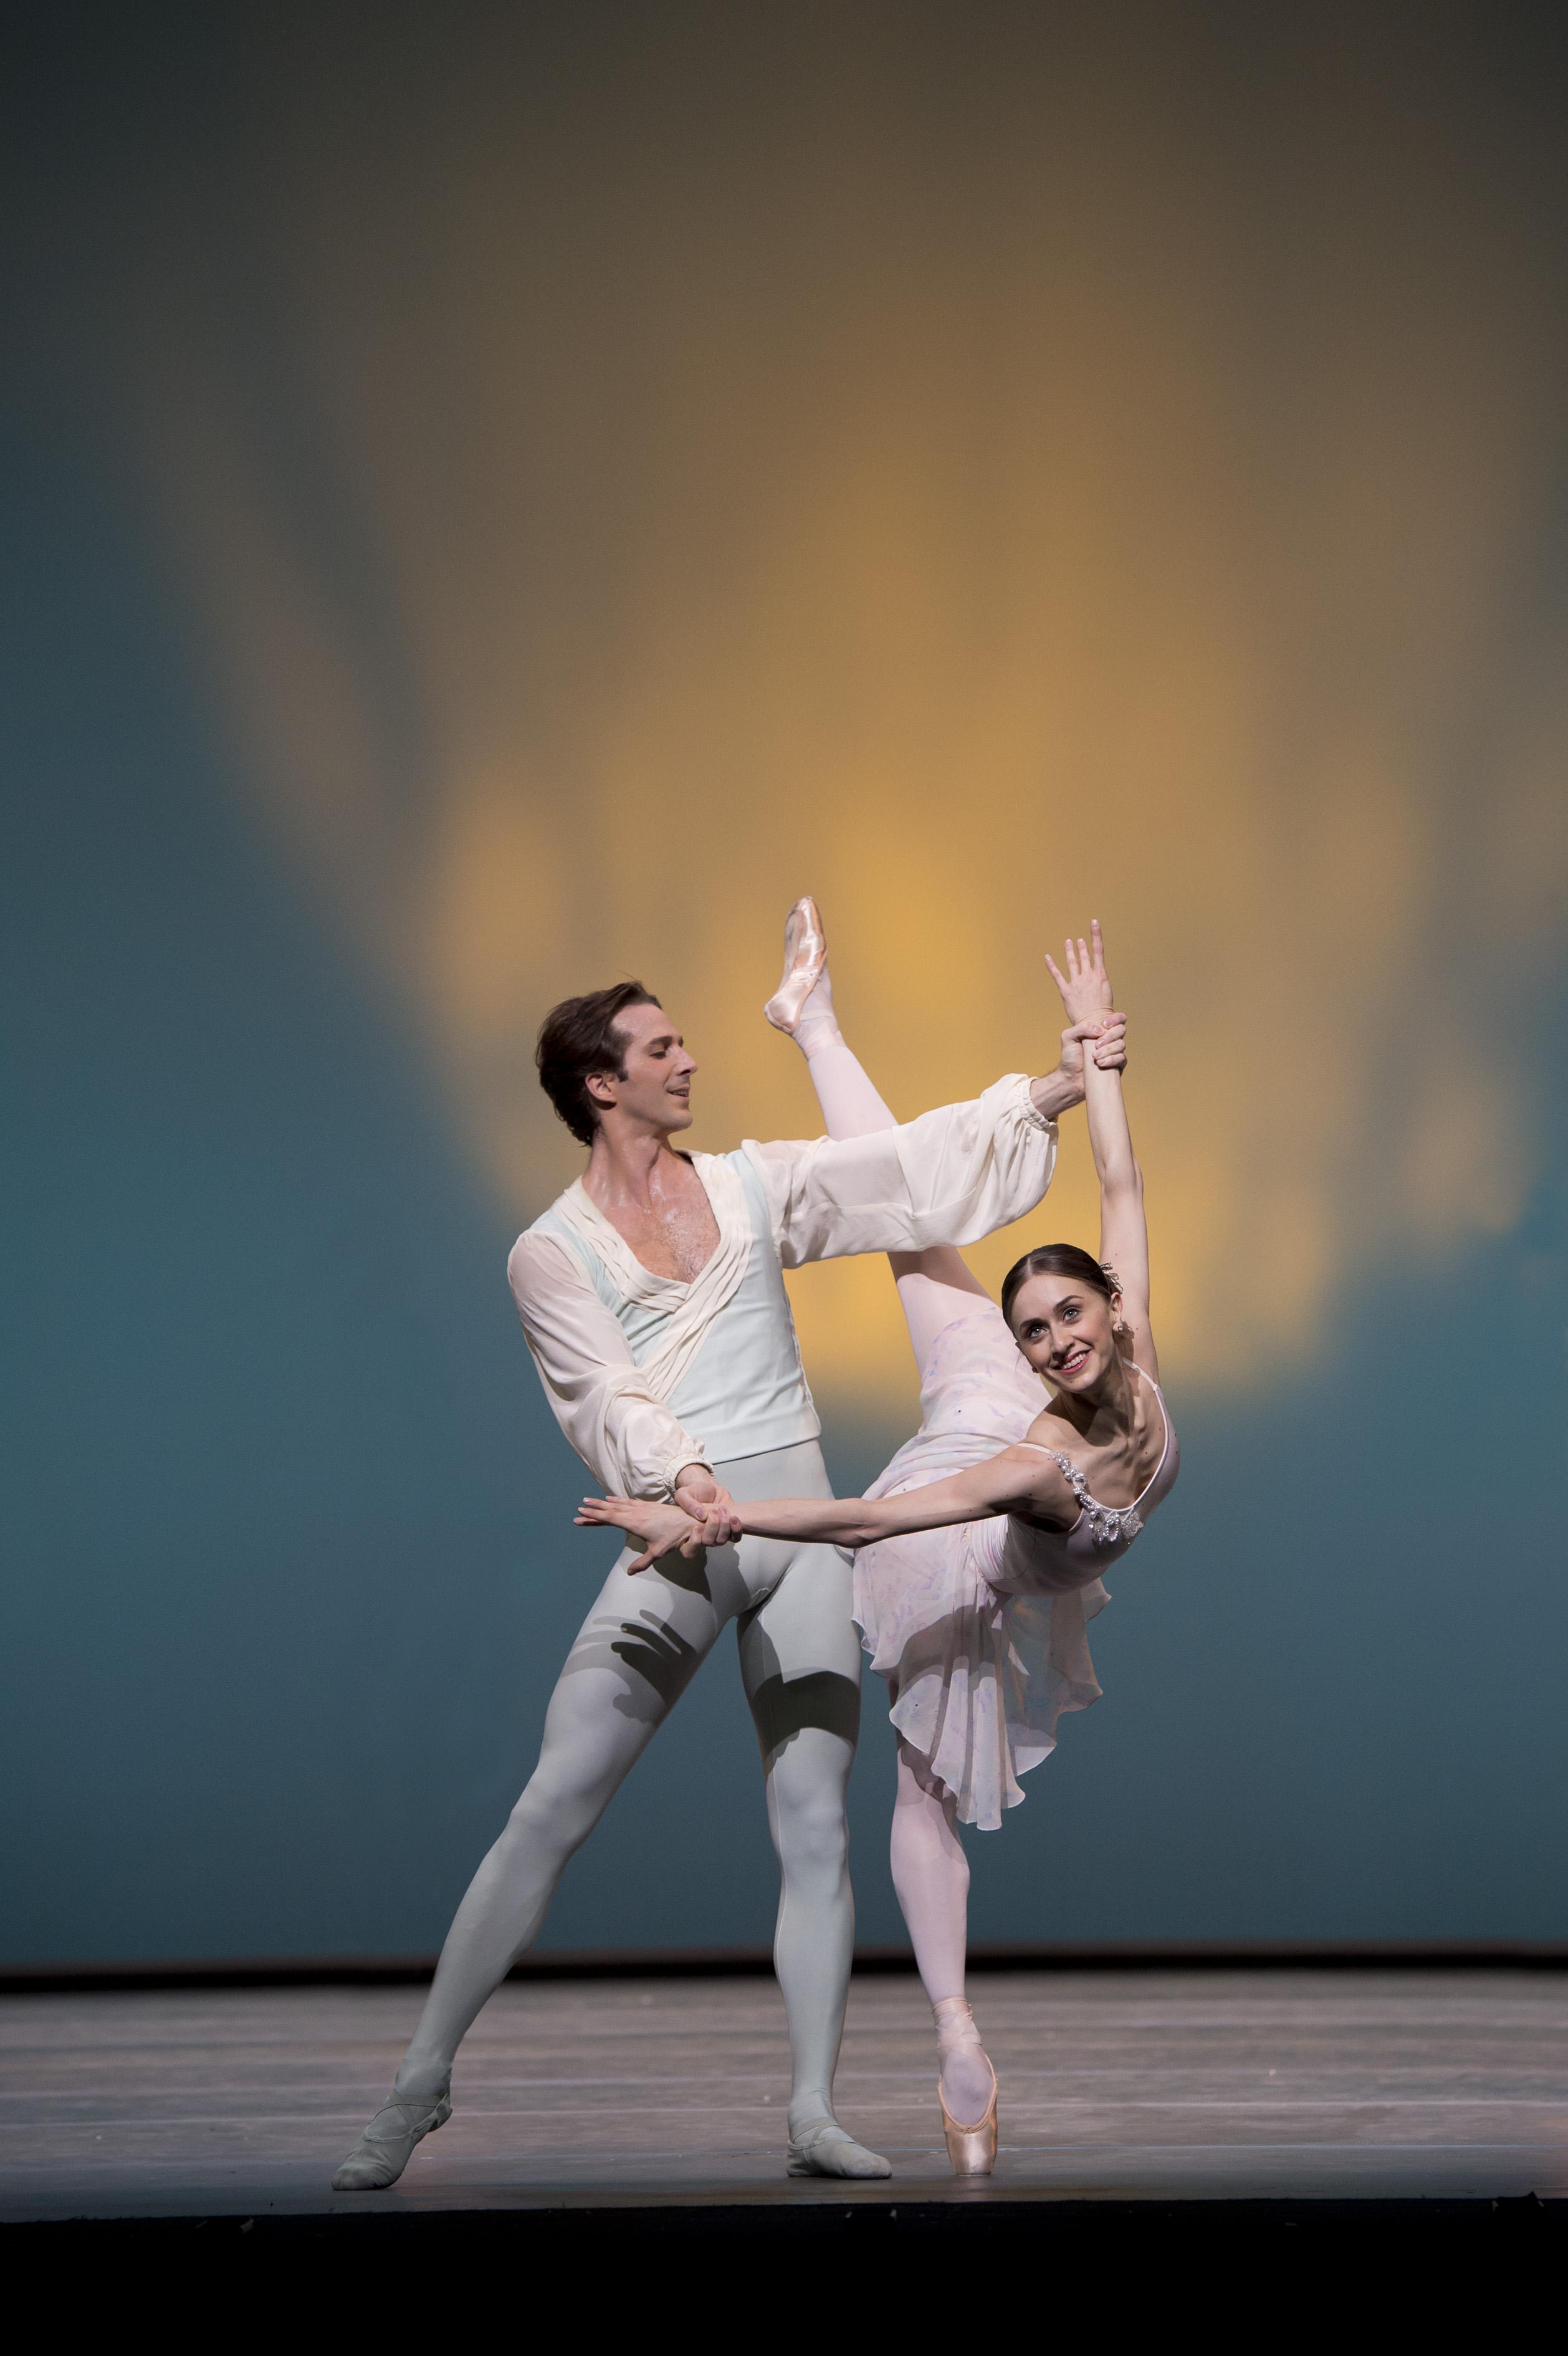 Marianela Nunez and Nehemiah Kish in Ballo della Regina - Photo Bill Cooper, courtesy of ROH